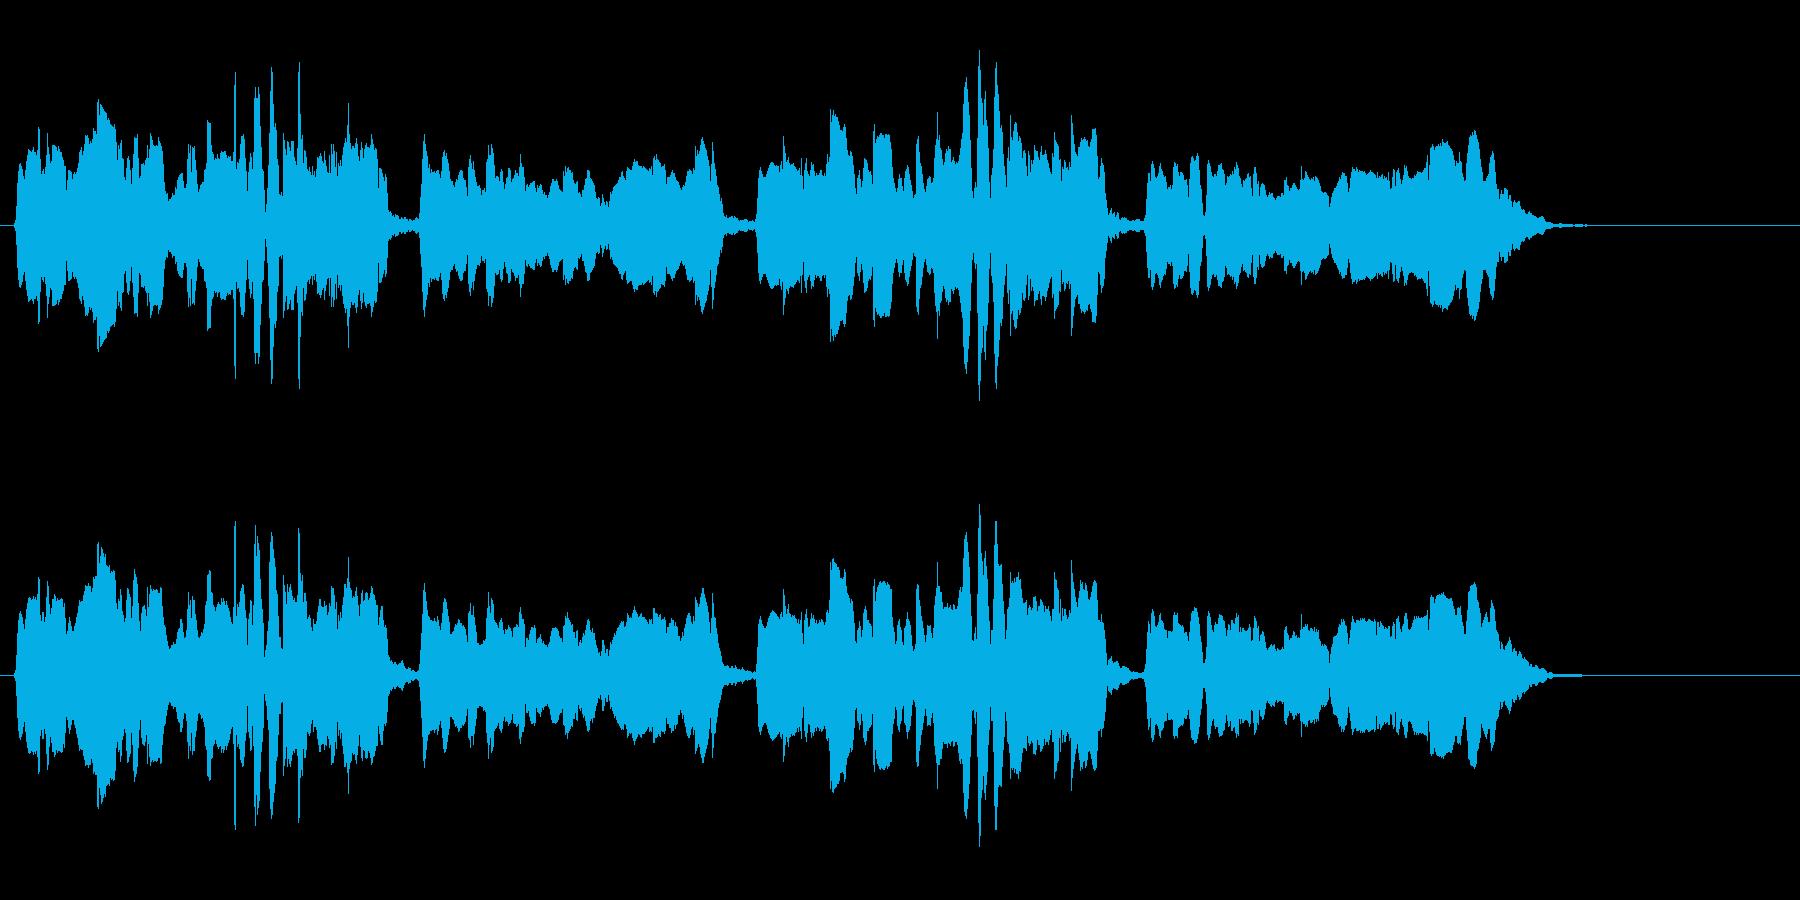 尺八 生演奏 古典風 残響音有 9の再生済みの波形